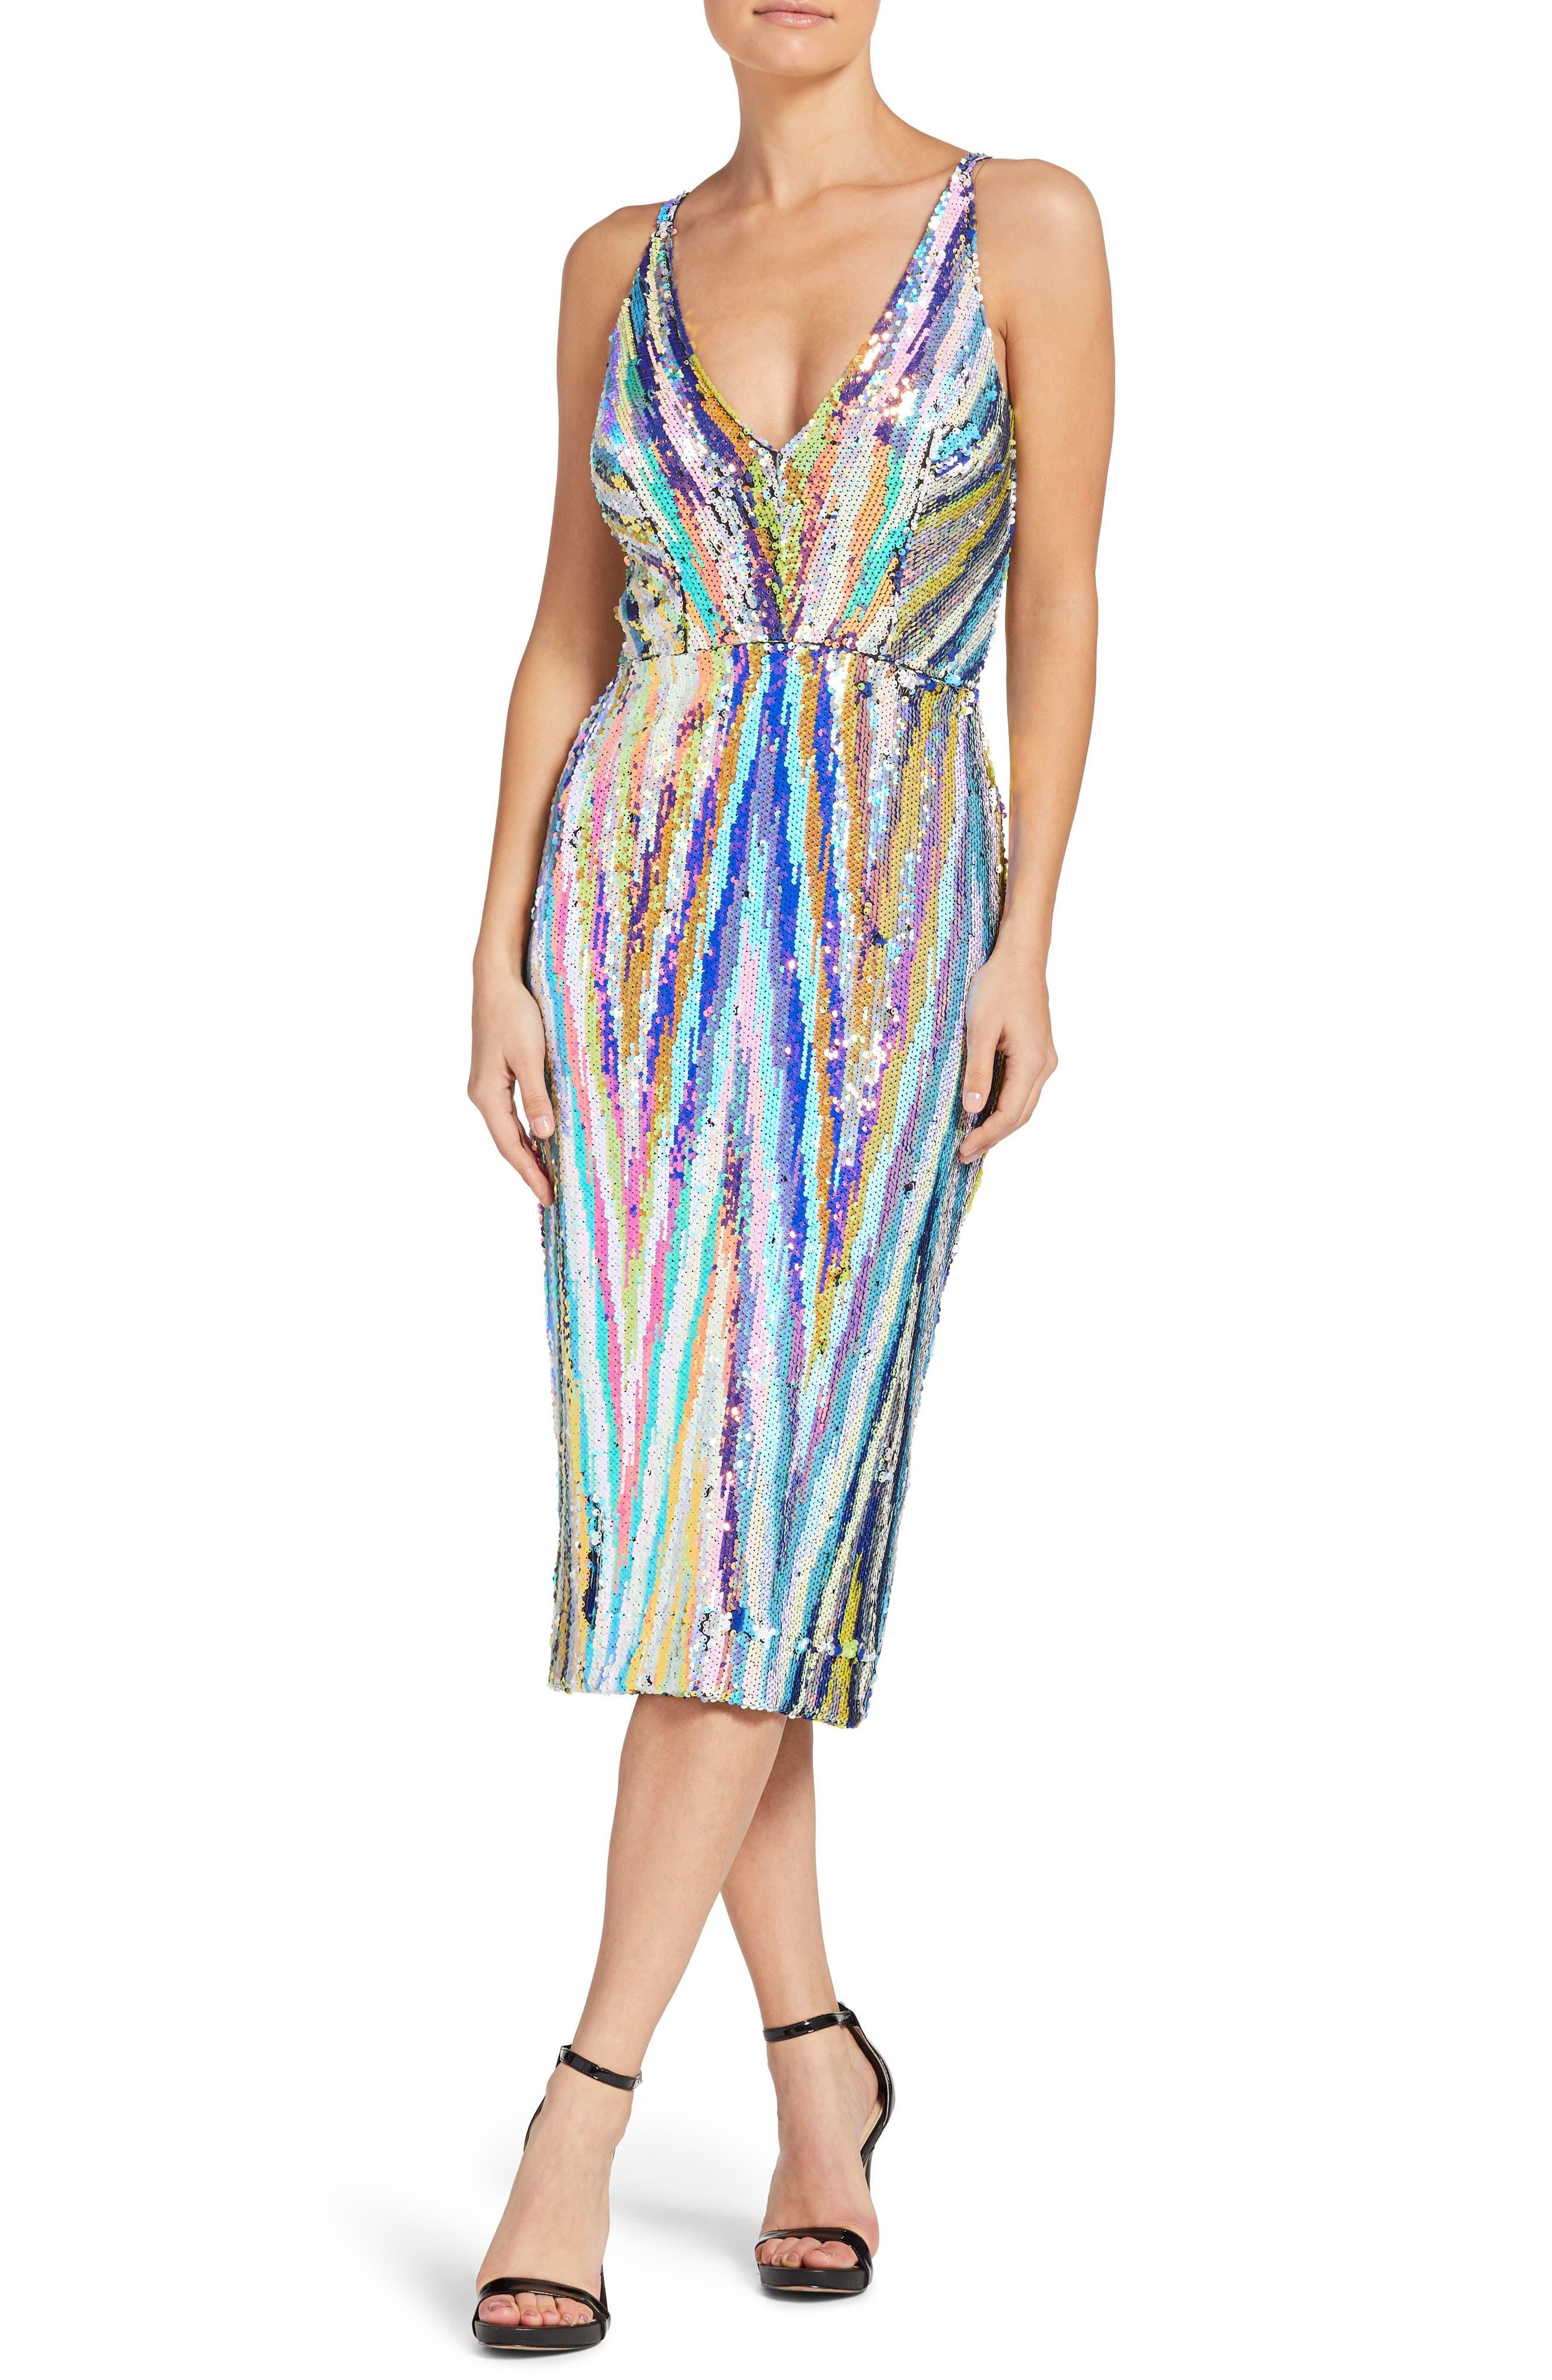 Margo Plunge Neck Sequin Dress,                             Main thumbnail 1, color,                             OPAL MULTI